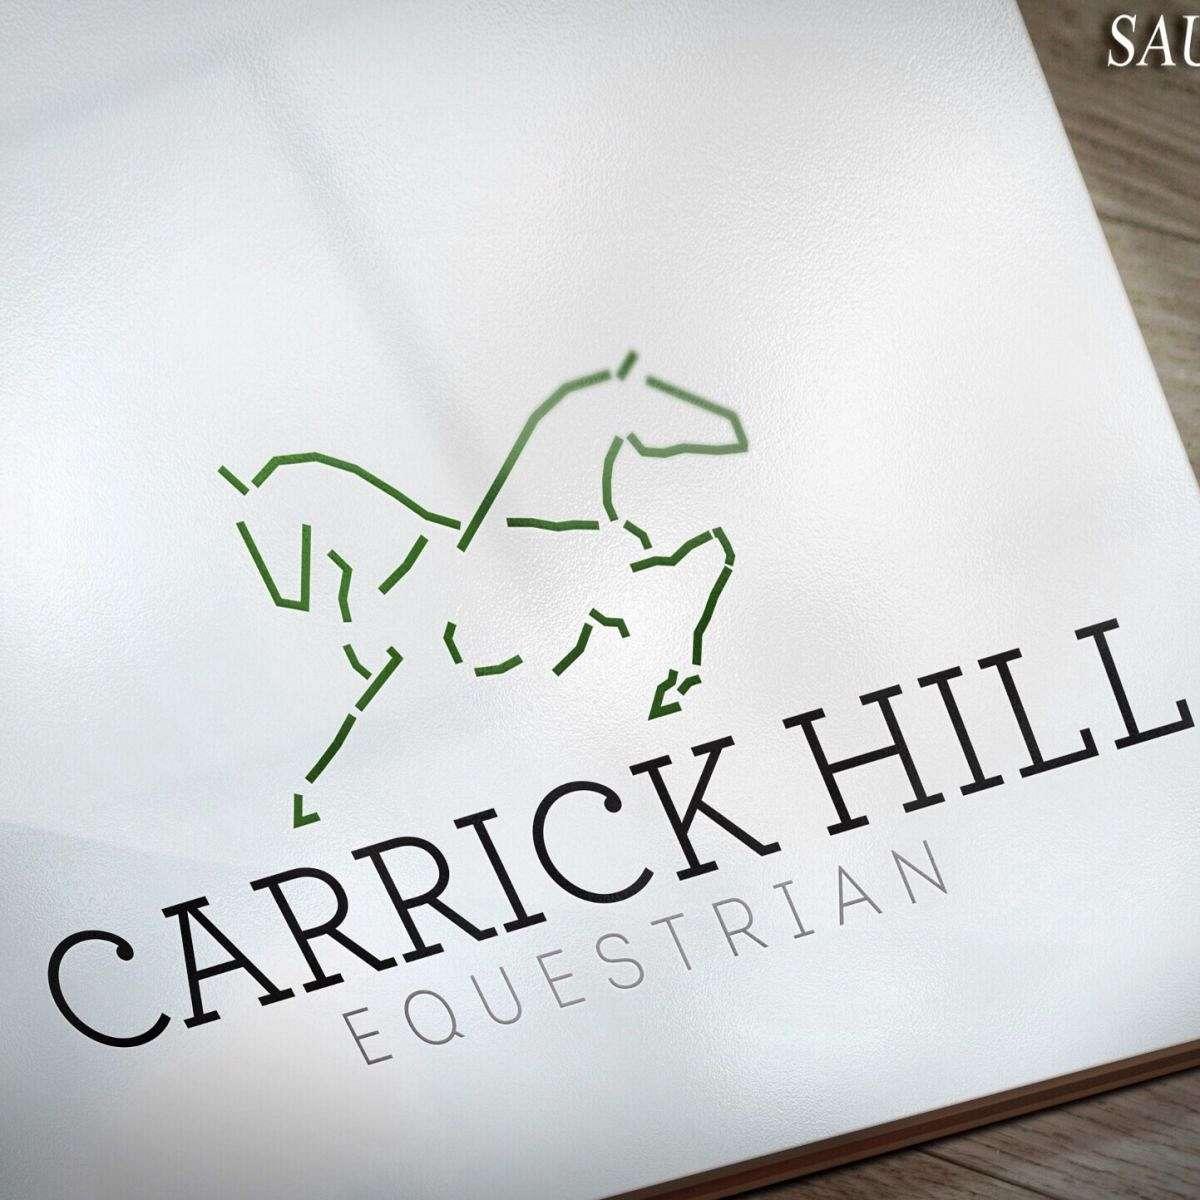 Carrick Hill Equestrian